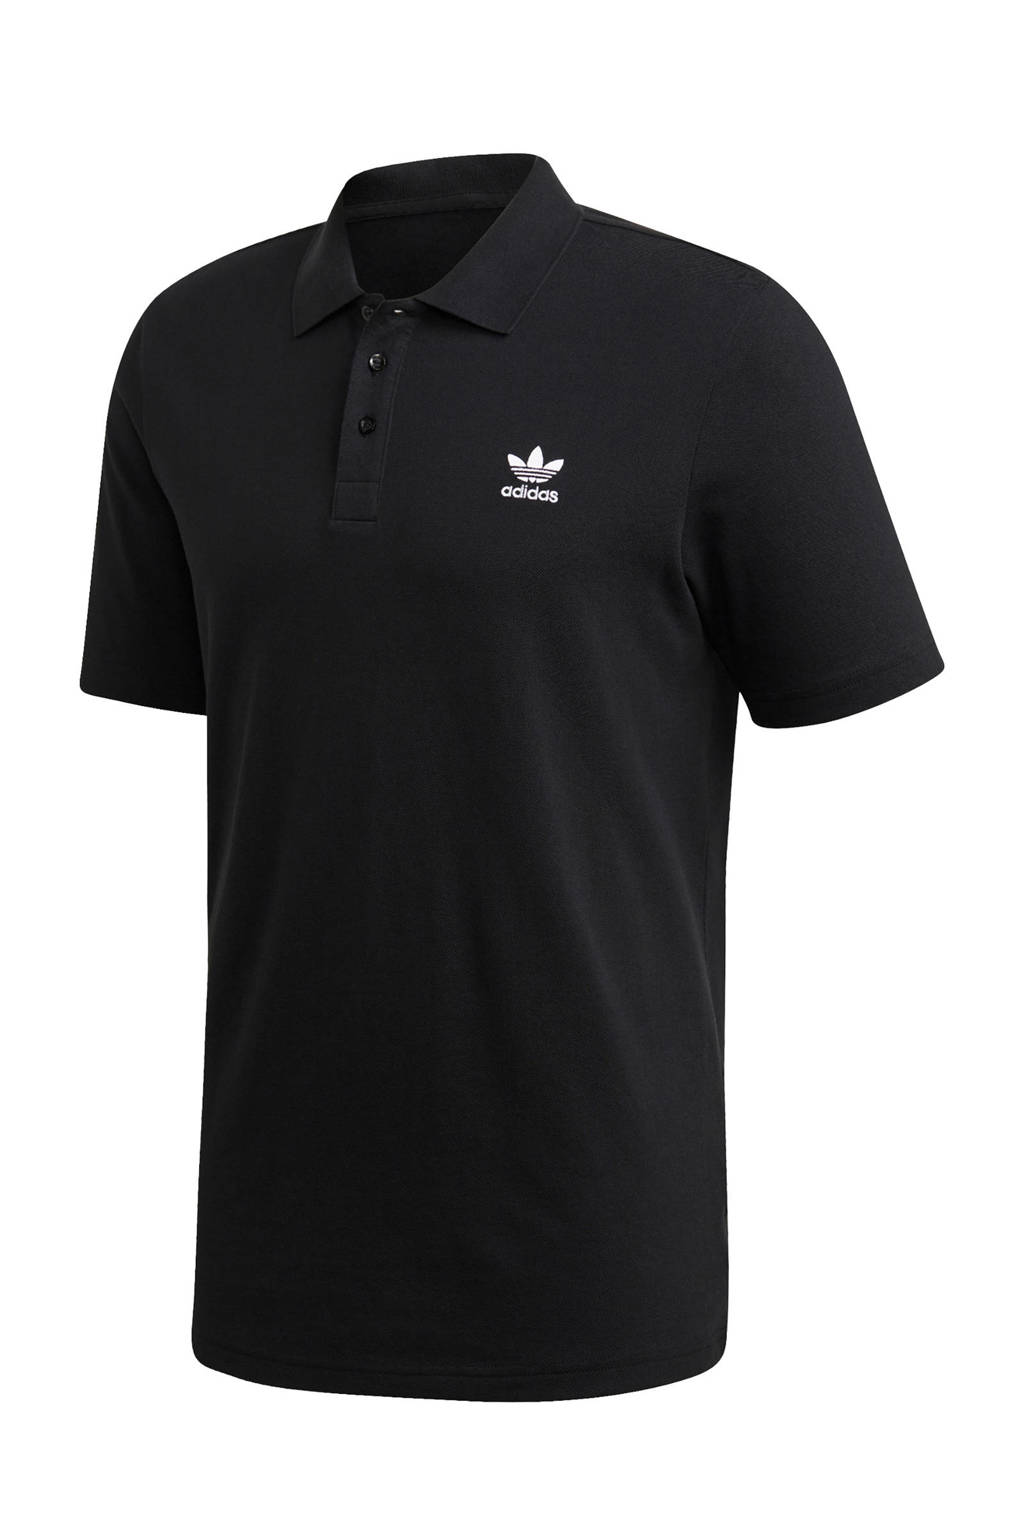 adidas Originals polo zwart, Zwart